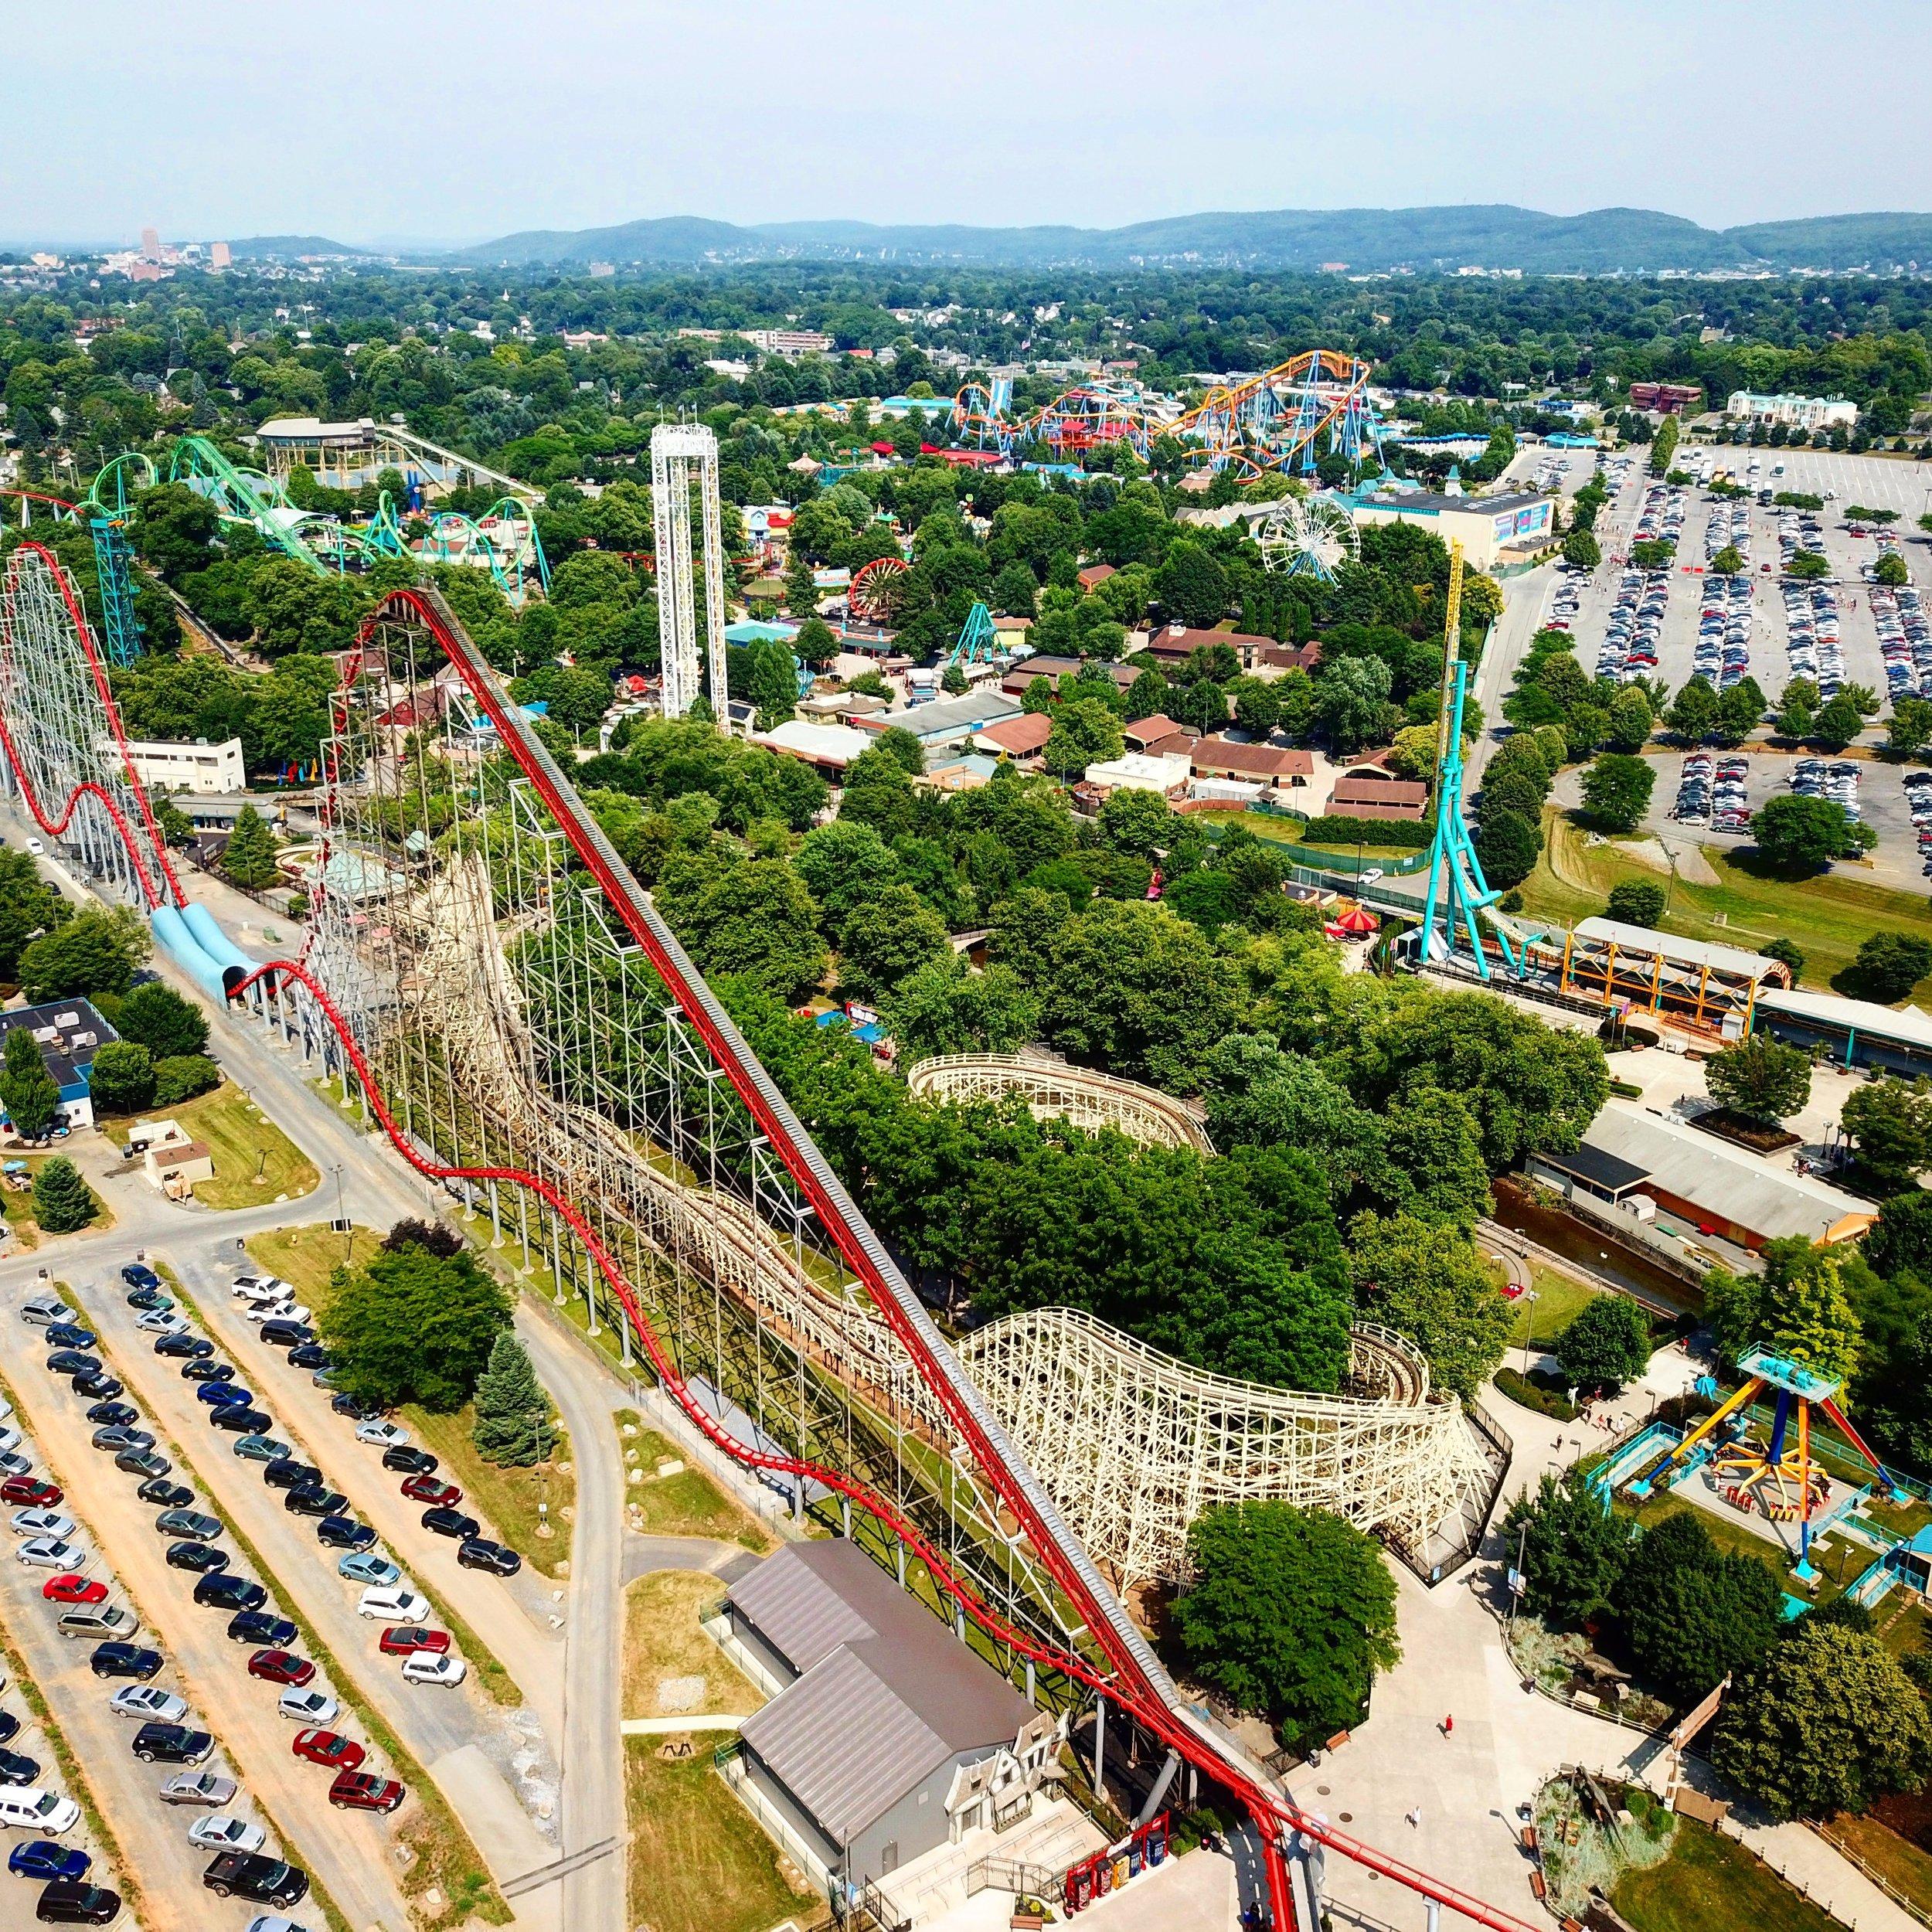 Dorney Park - Allentown, Pennsylvania